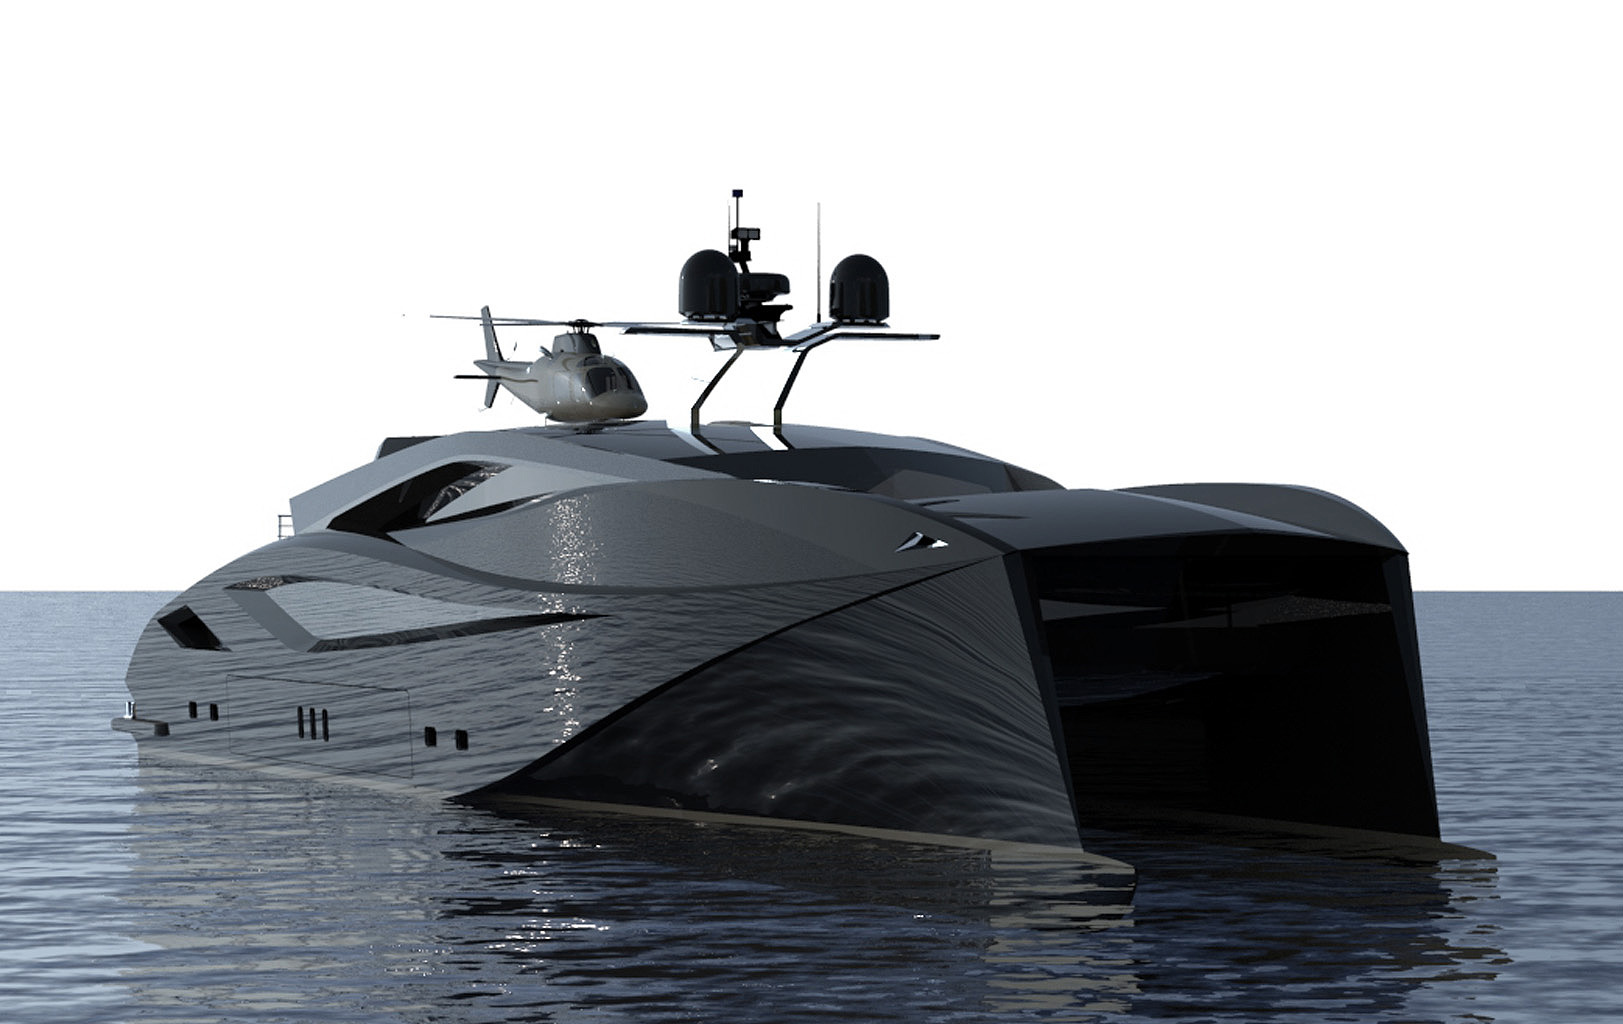 Power catamaran designs - Designindustria 120 Power Catamaran